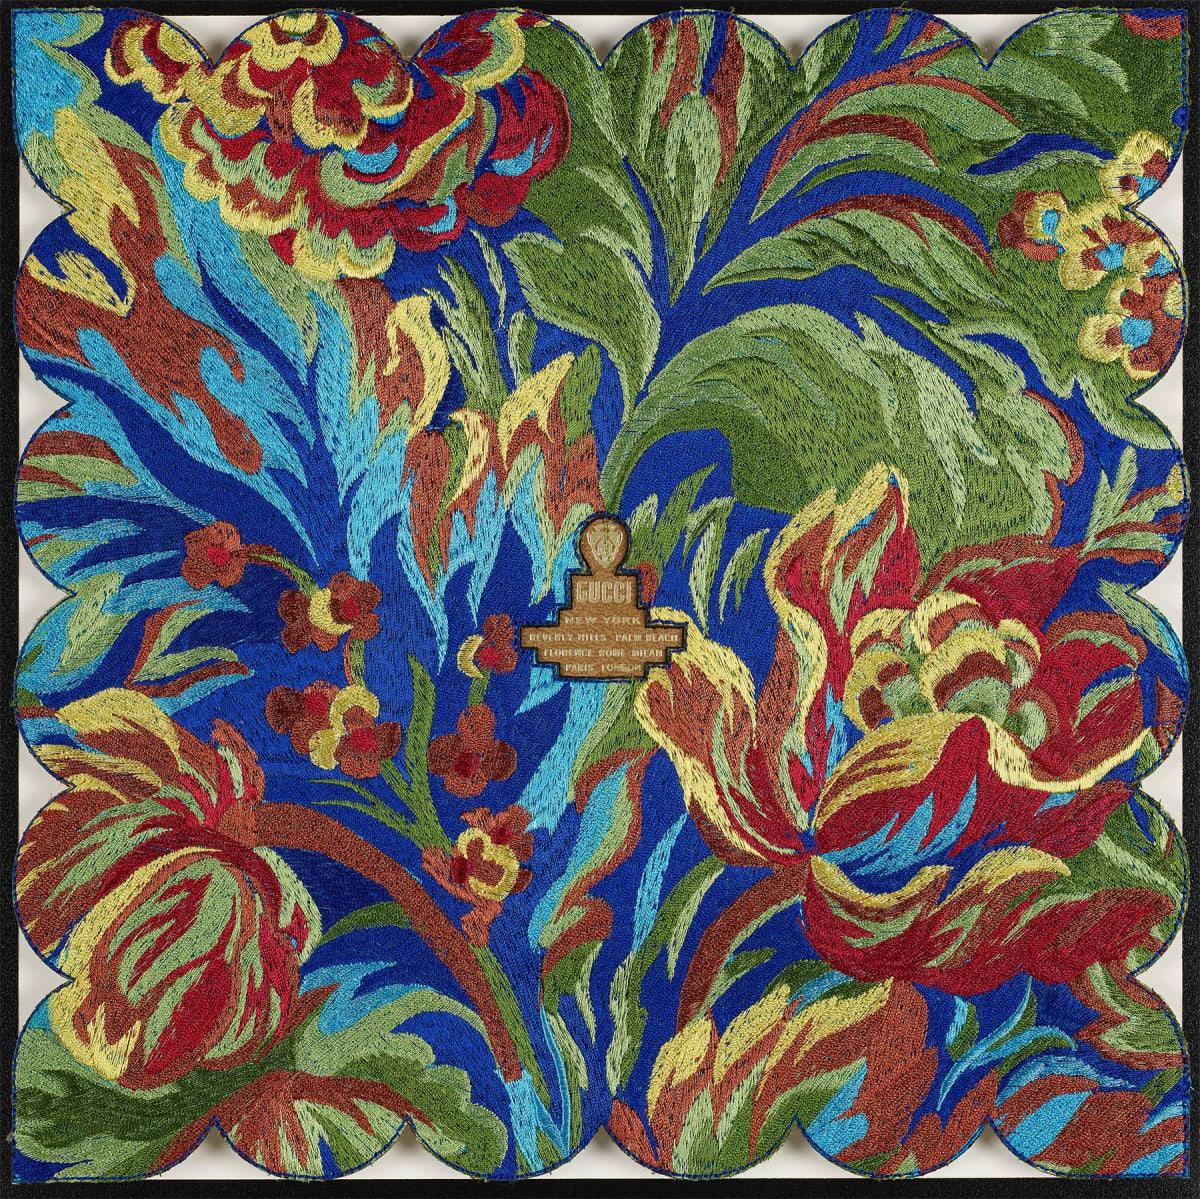 Stephen Wilson, Vintage Gucci Tapestry, 2019